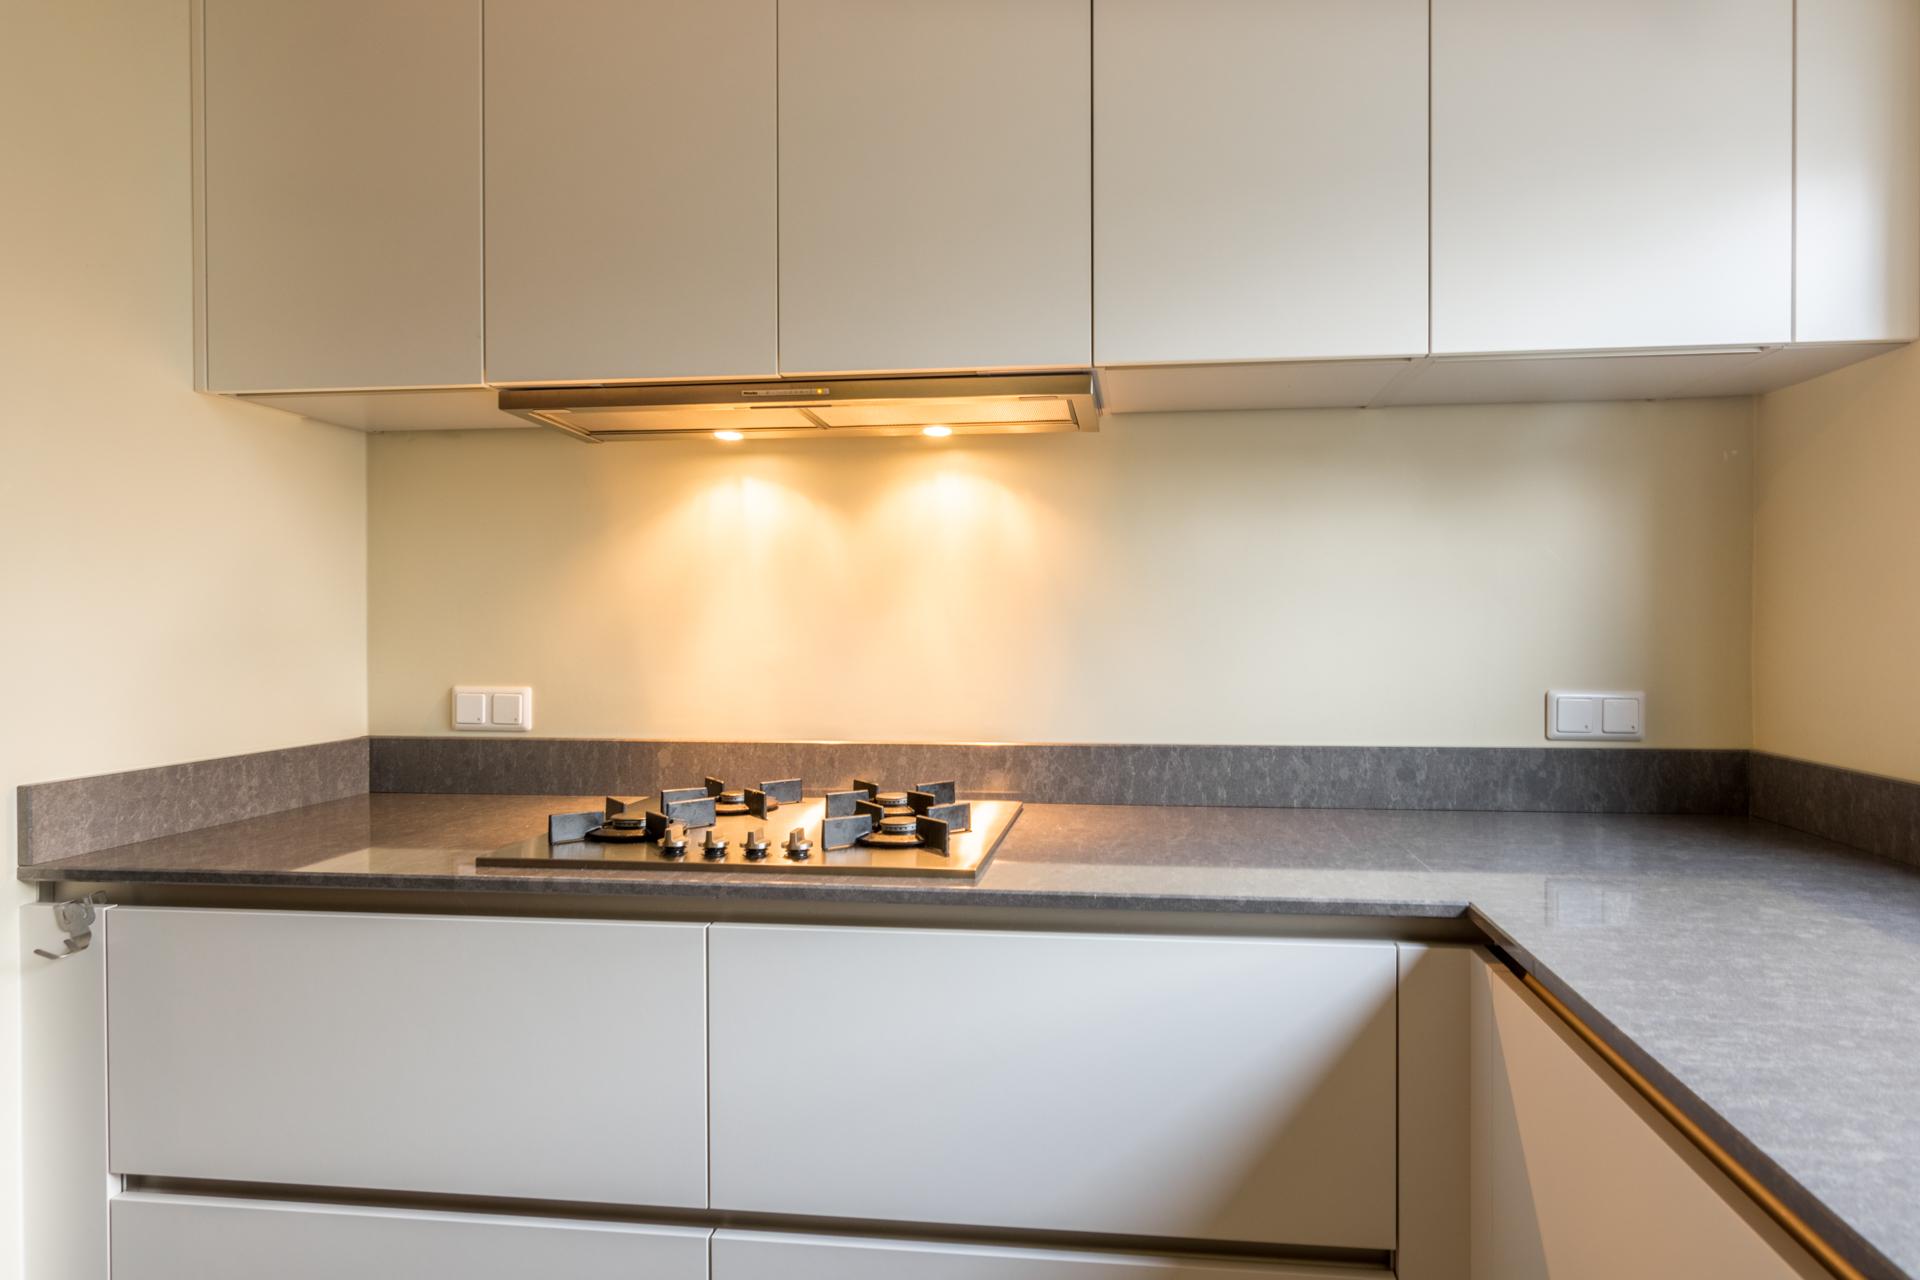 Bruynzeel keukenkast deurtjes bruynzeel keukenkast beste inspiratie voor huis ontwerp - Idee van interieurontwerp ...